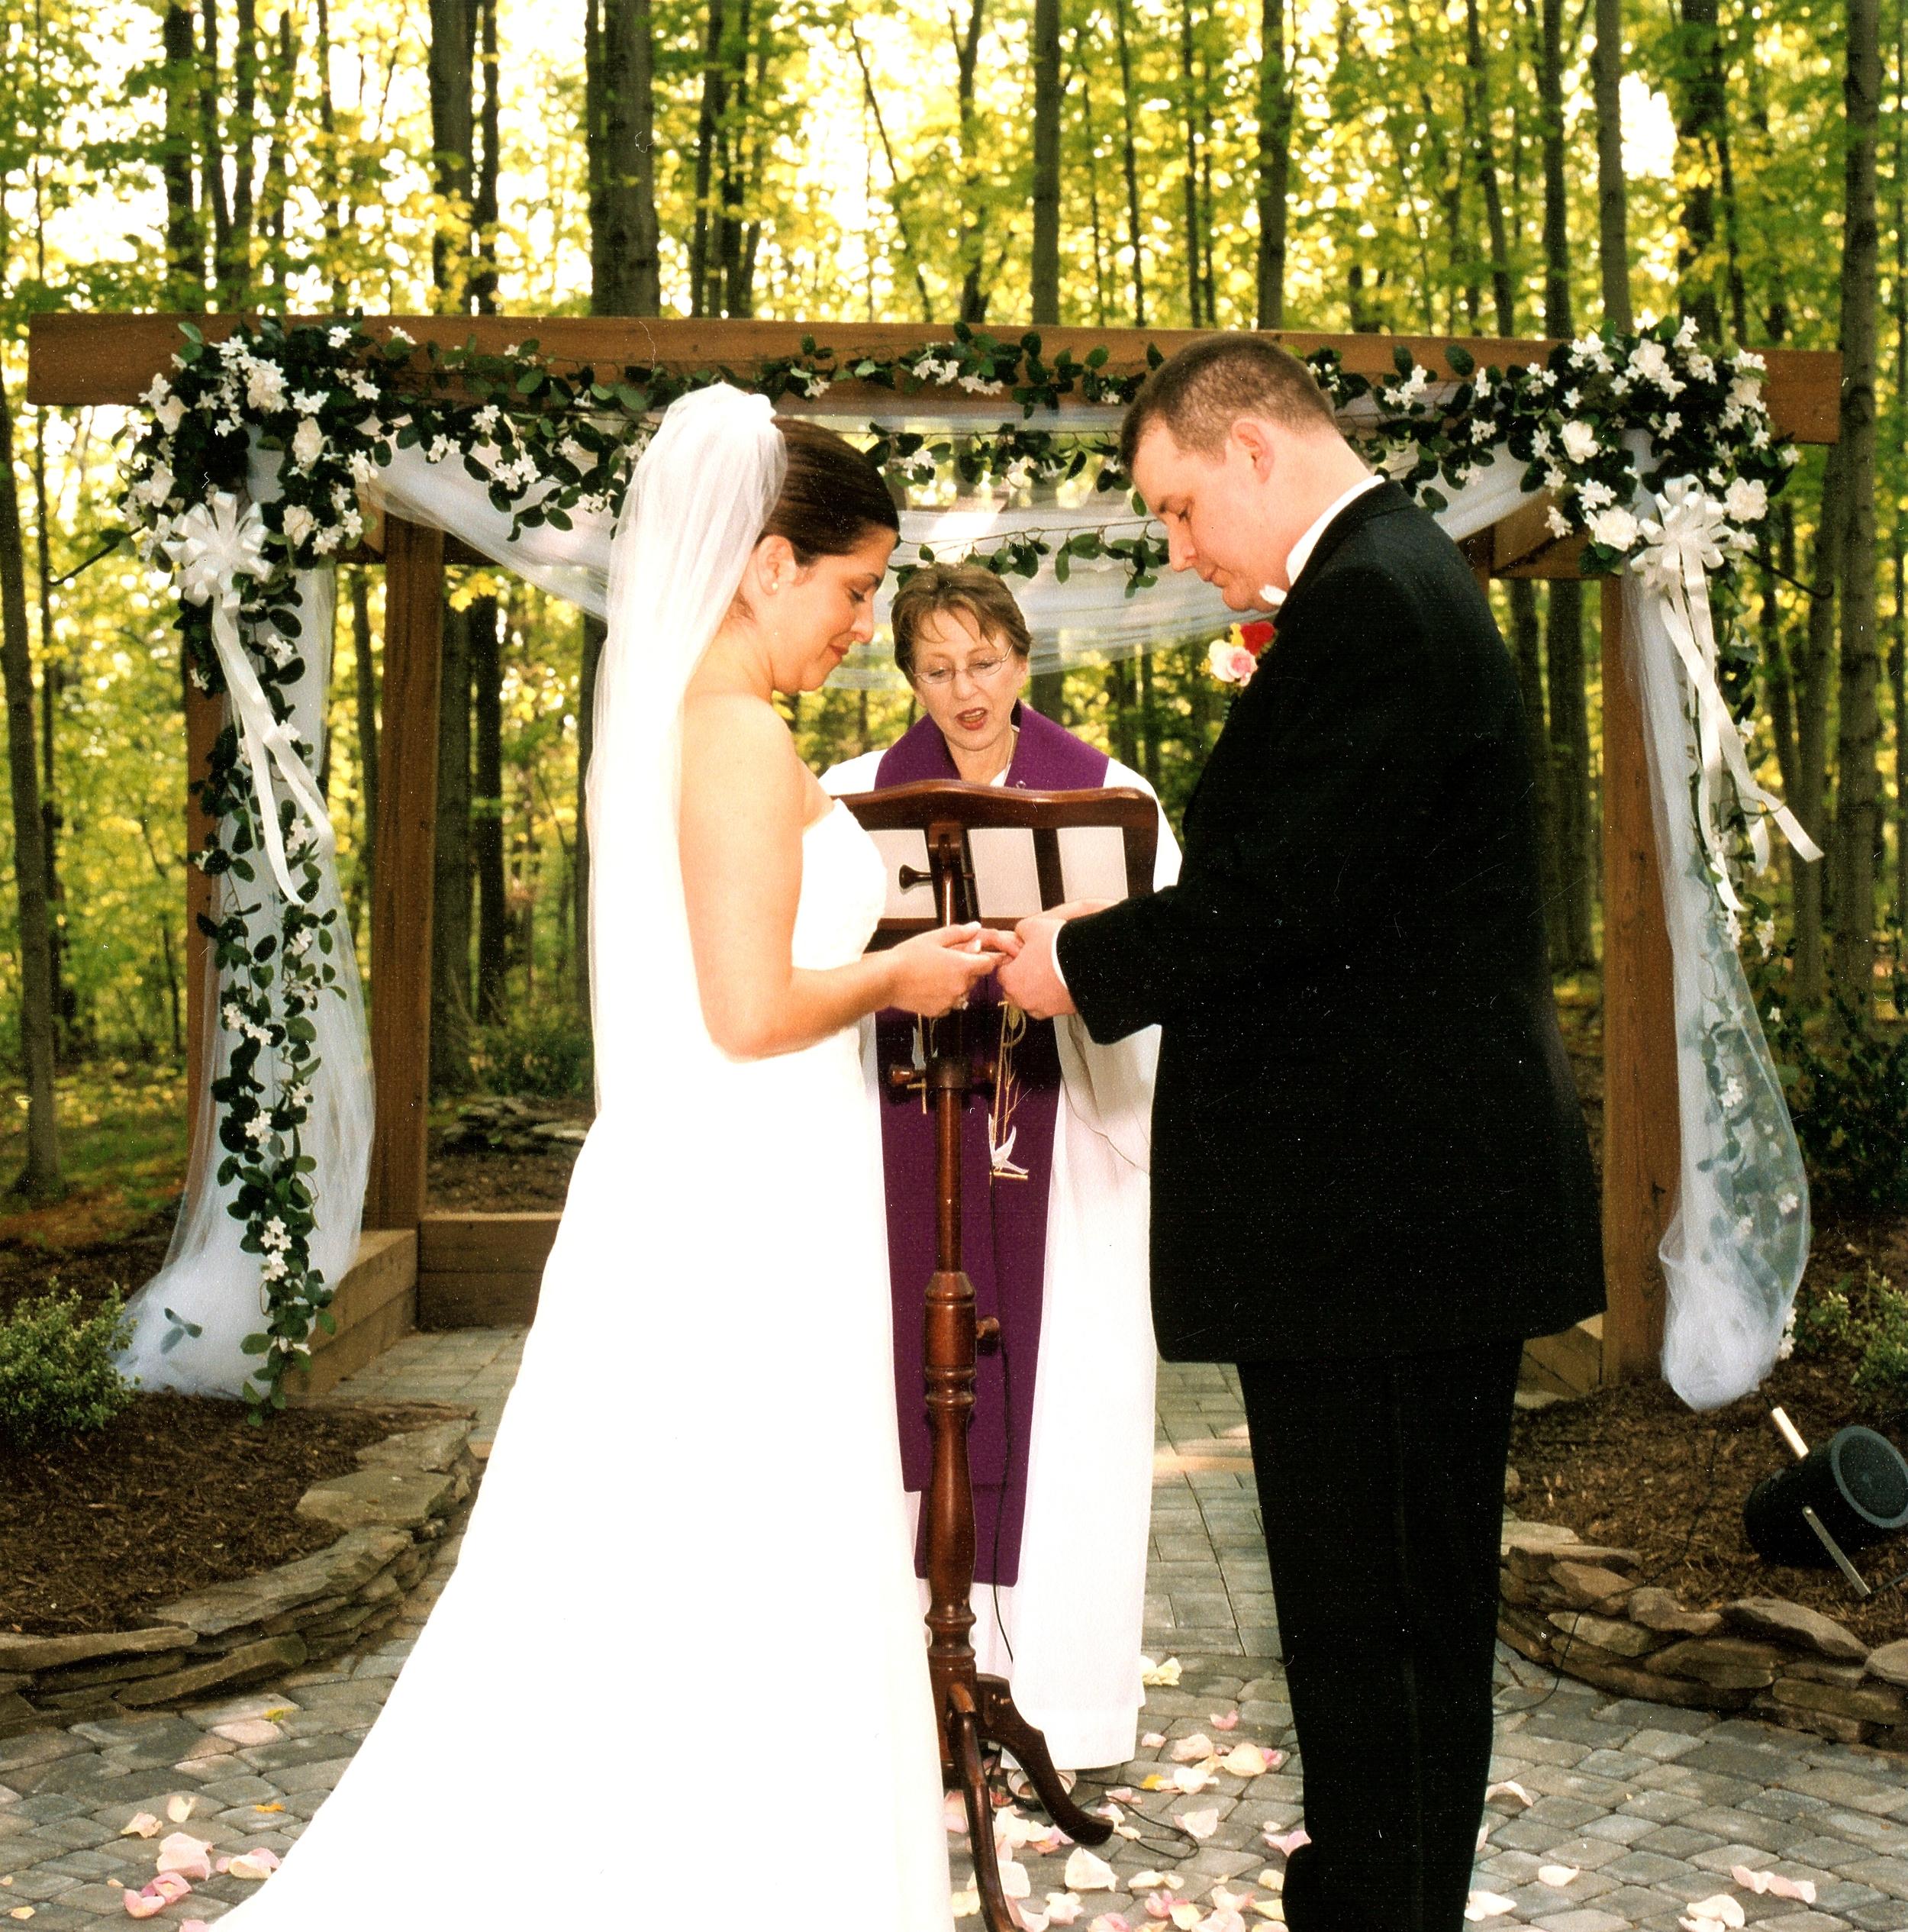  H2 Wedding Photo 11.jpg